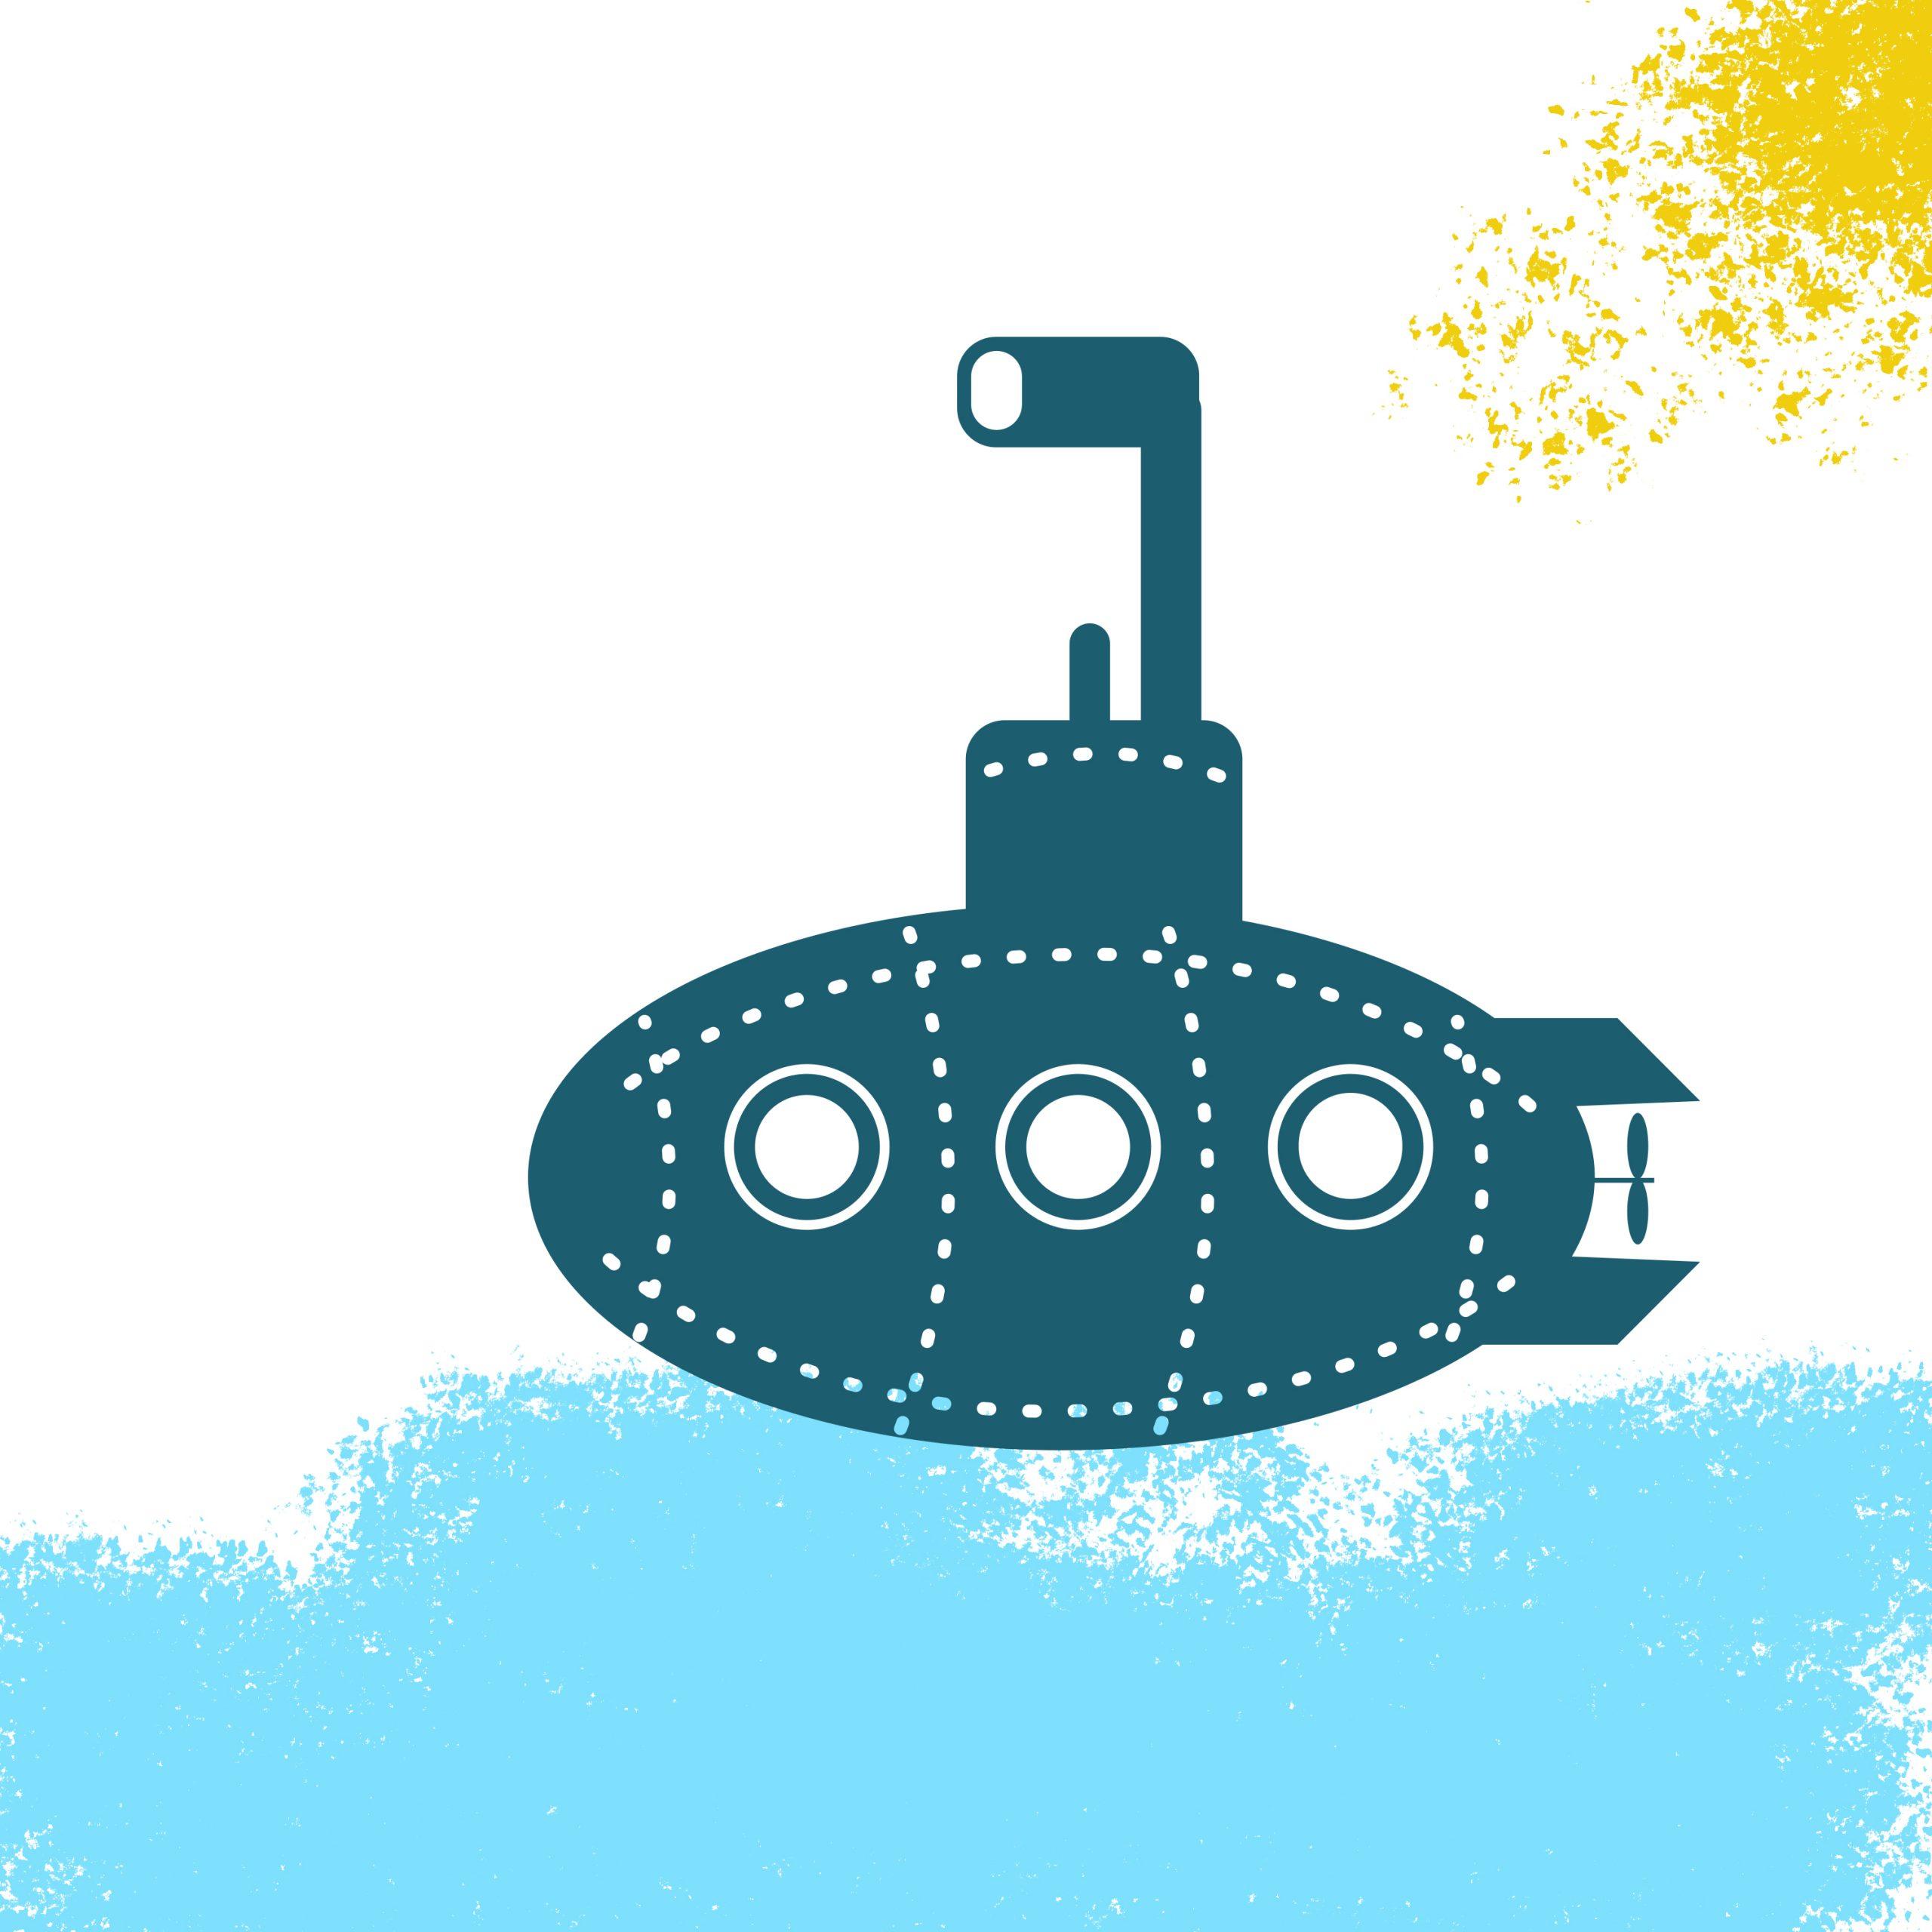 A ship illustration